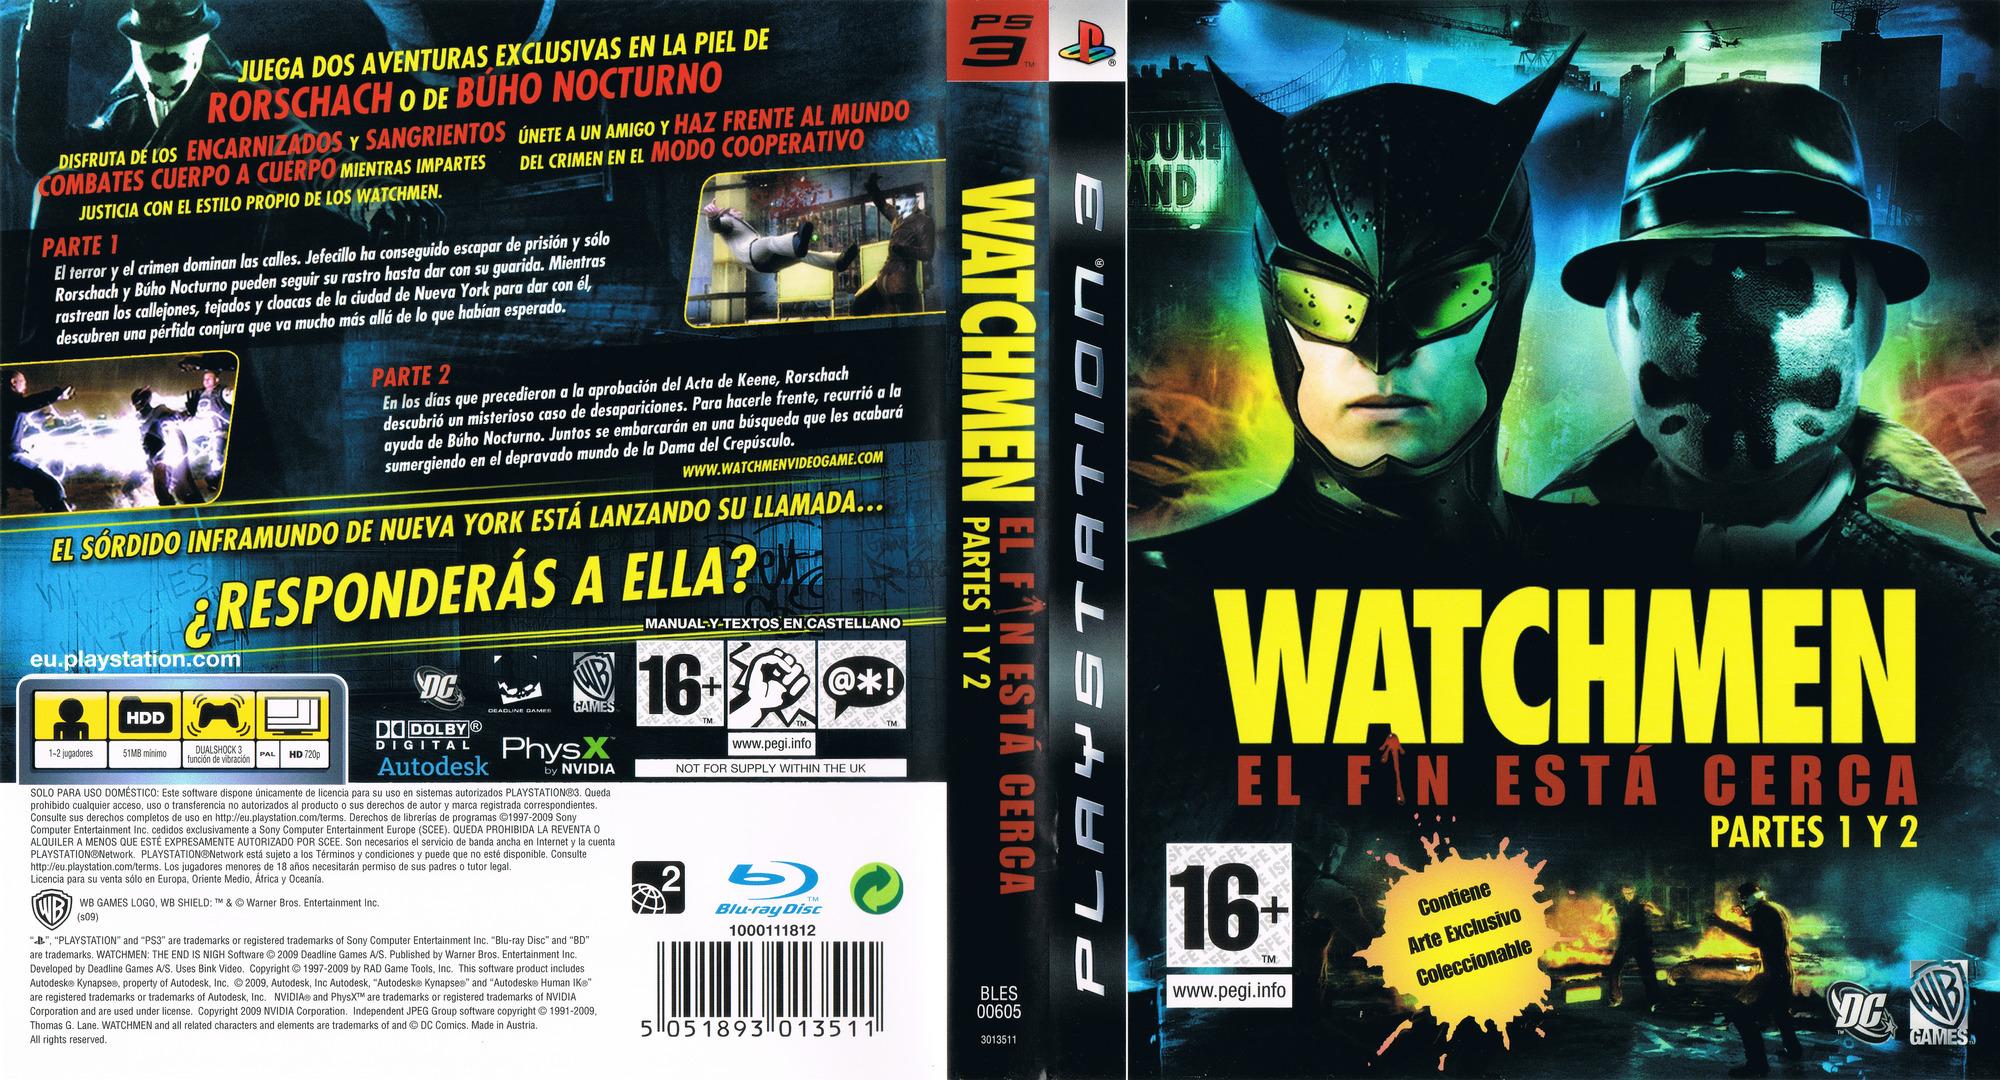 Watchmen: El Fin Está Cerca - Partes 1 y 2 PS3 coverfullHQ (BLES00605)